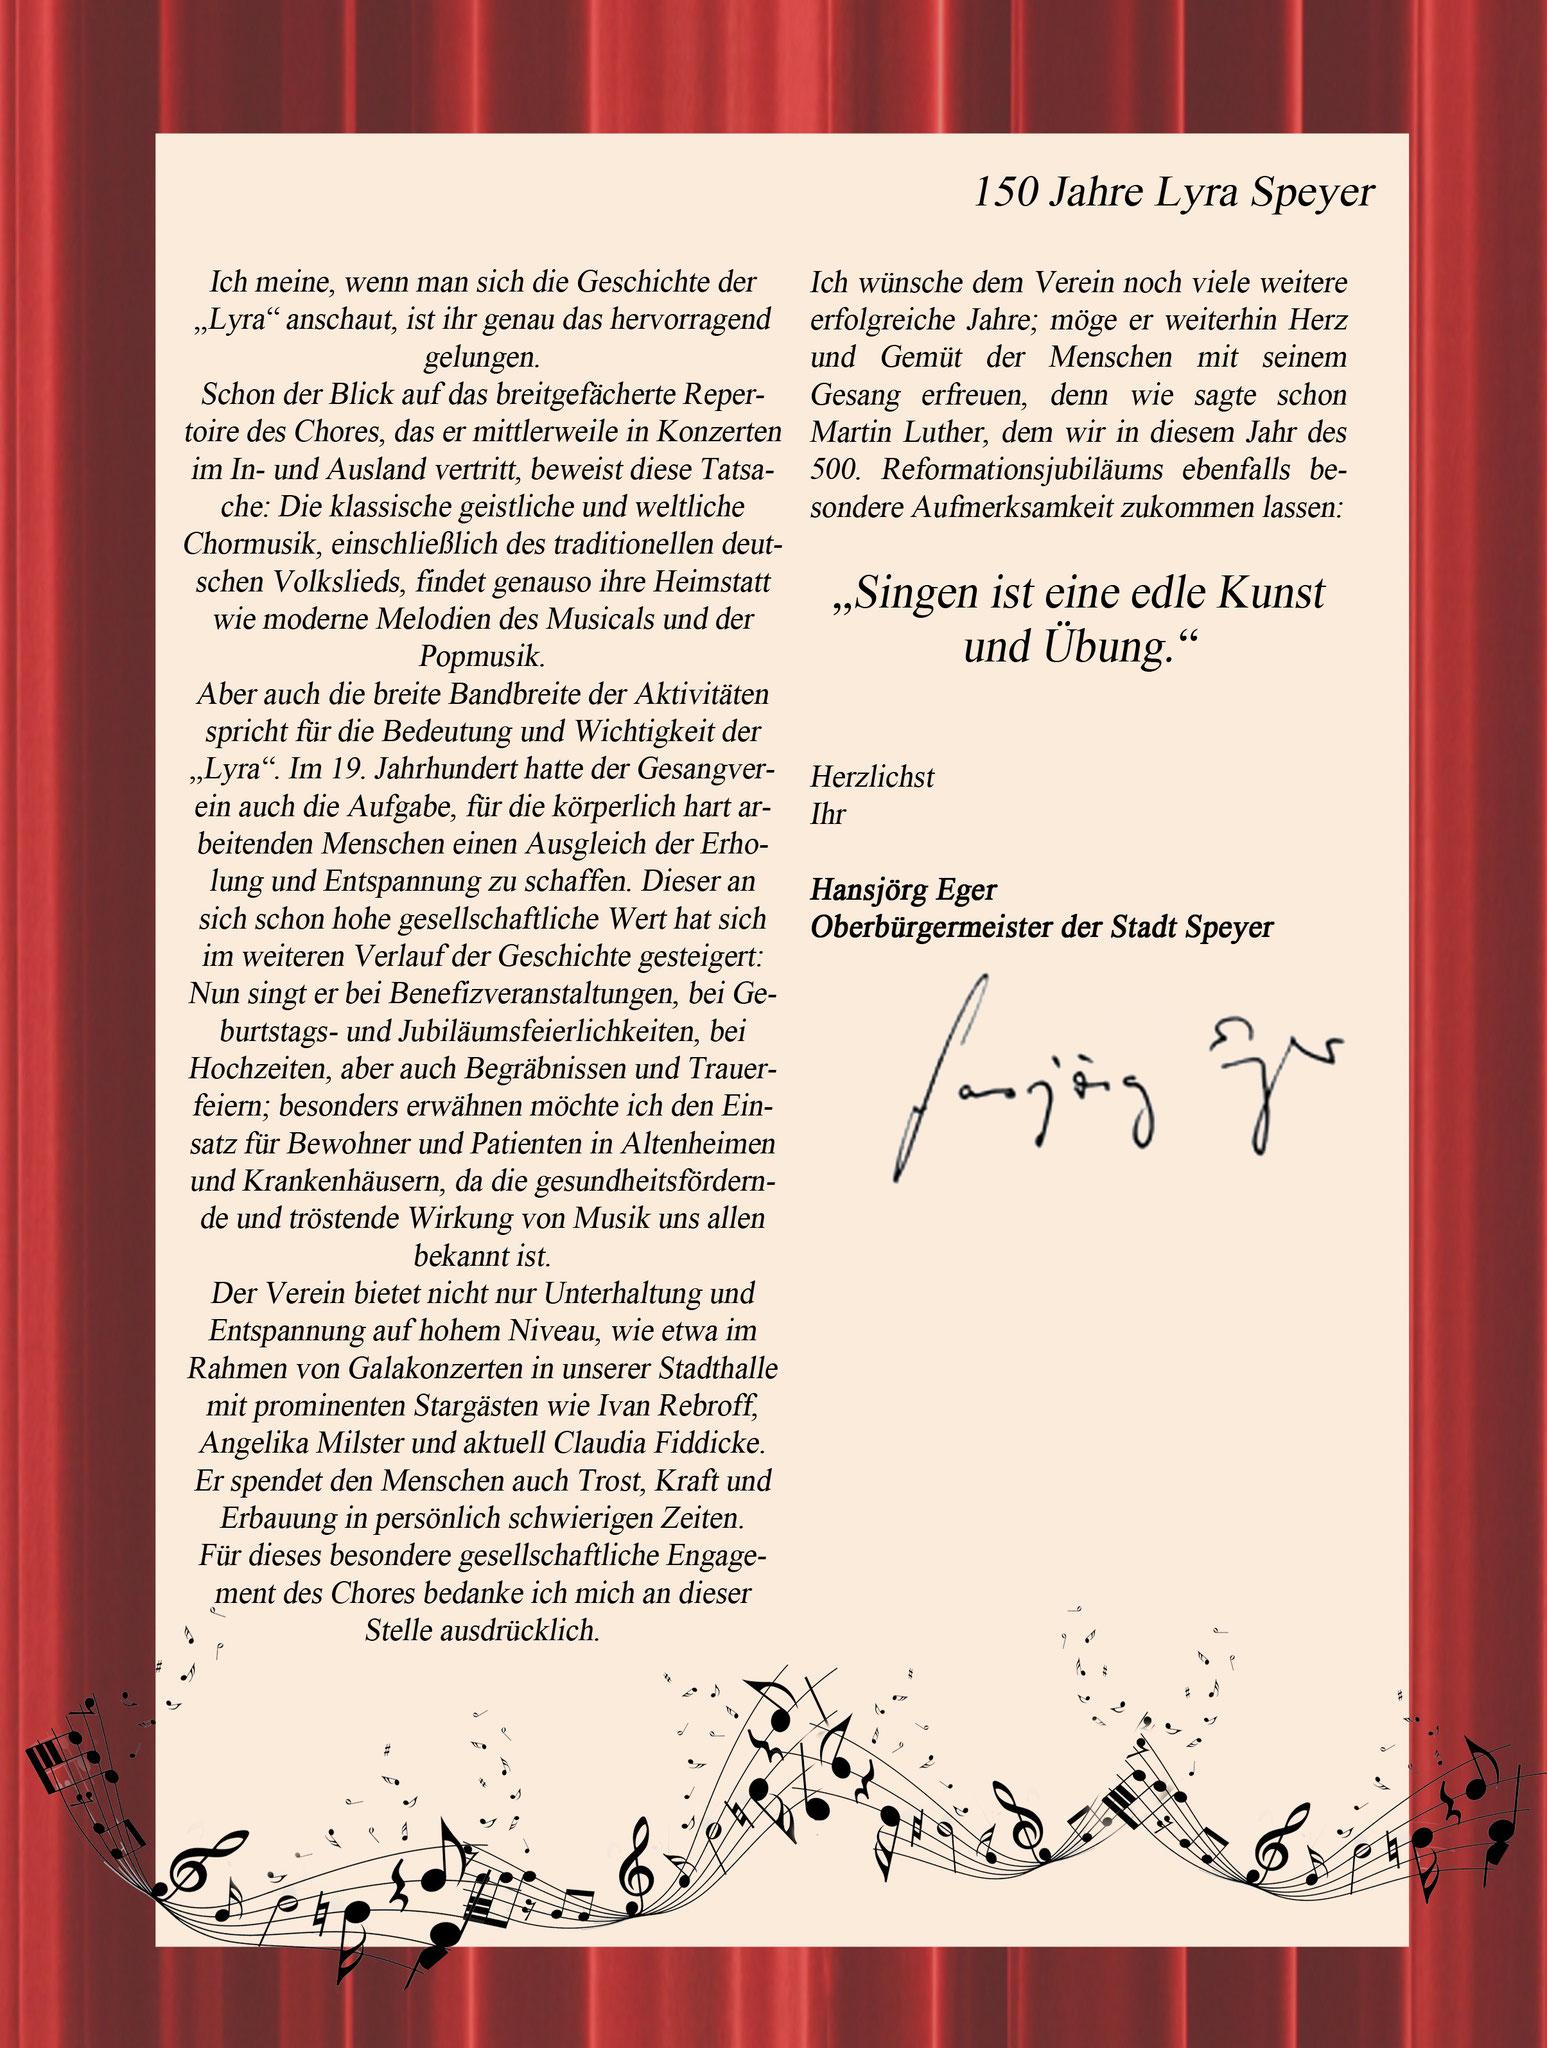 Grußwort OB Eger Seite 2